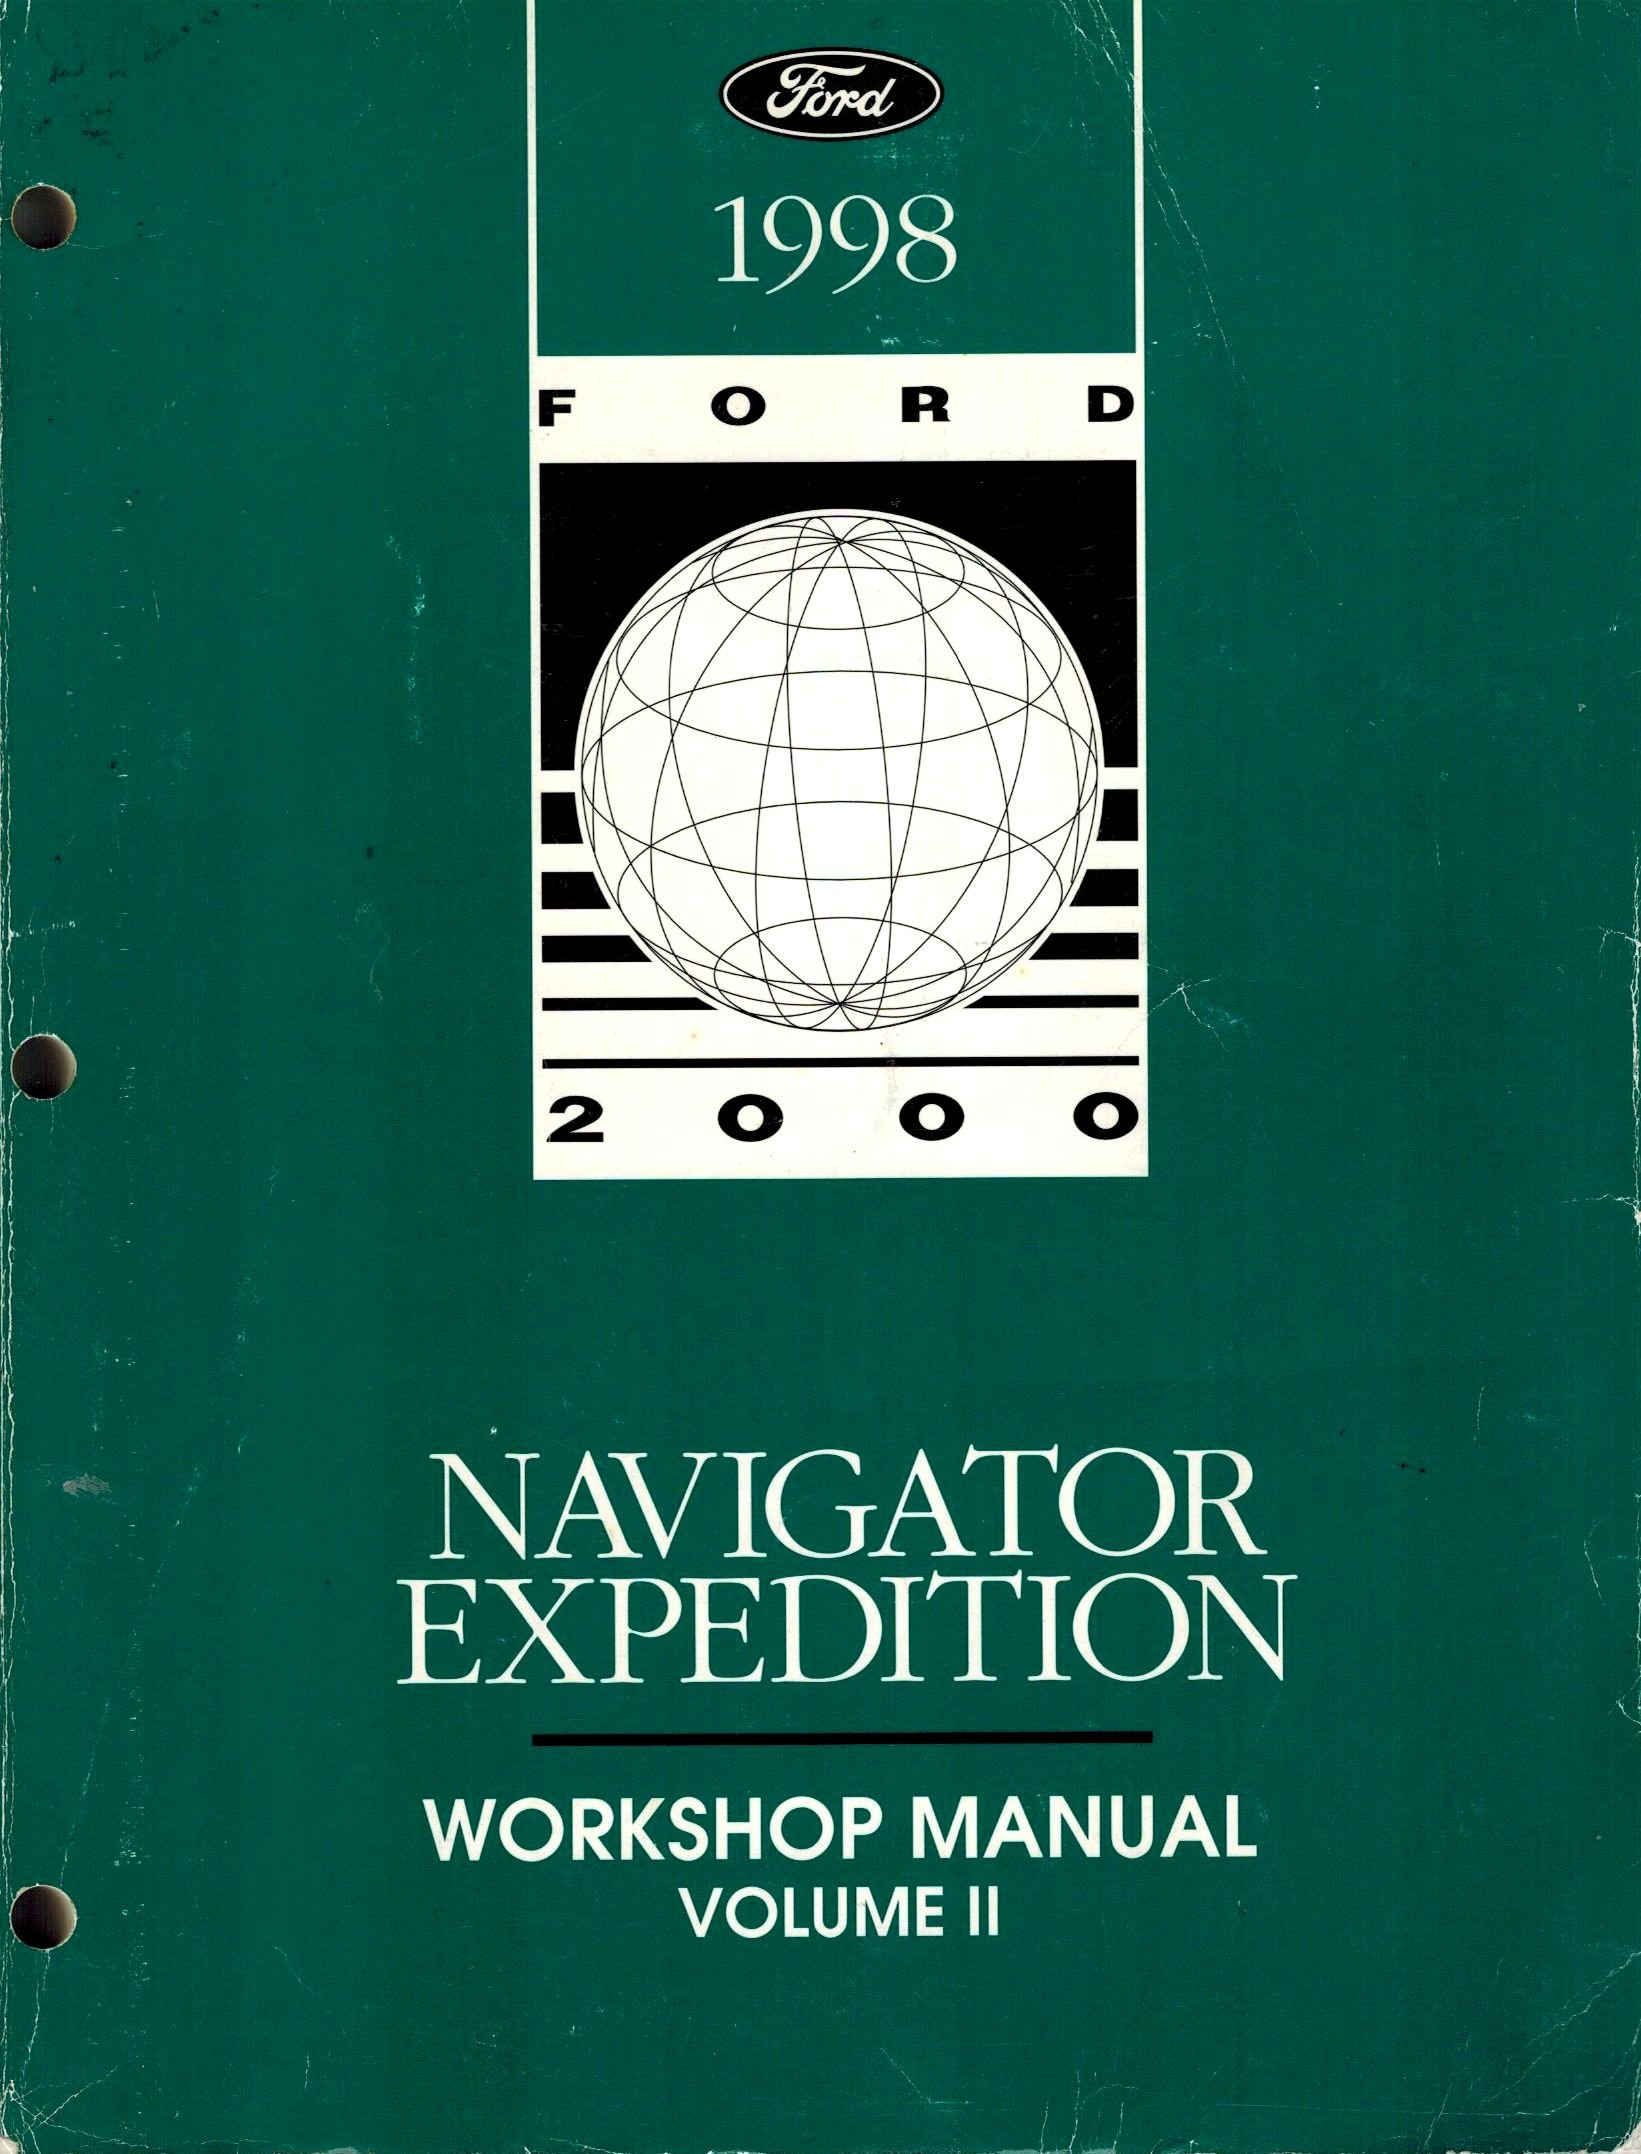 1998 Ford Navigator Expedition Workshop Manual (Volume II): Ford Motor  Company: Amazon.com: Books